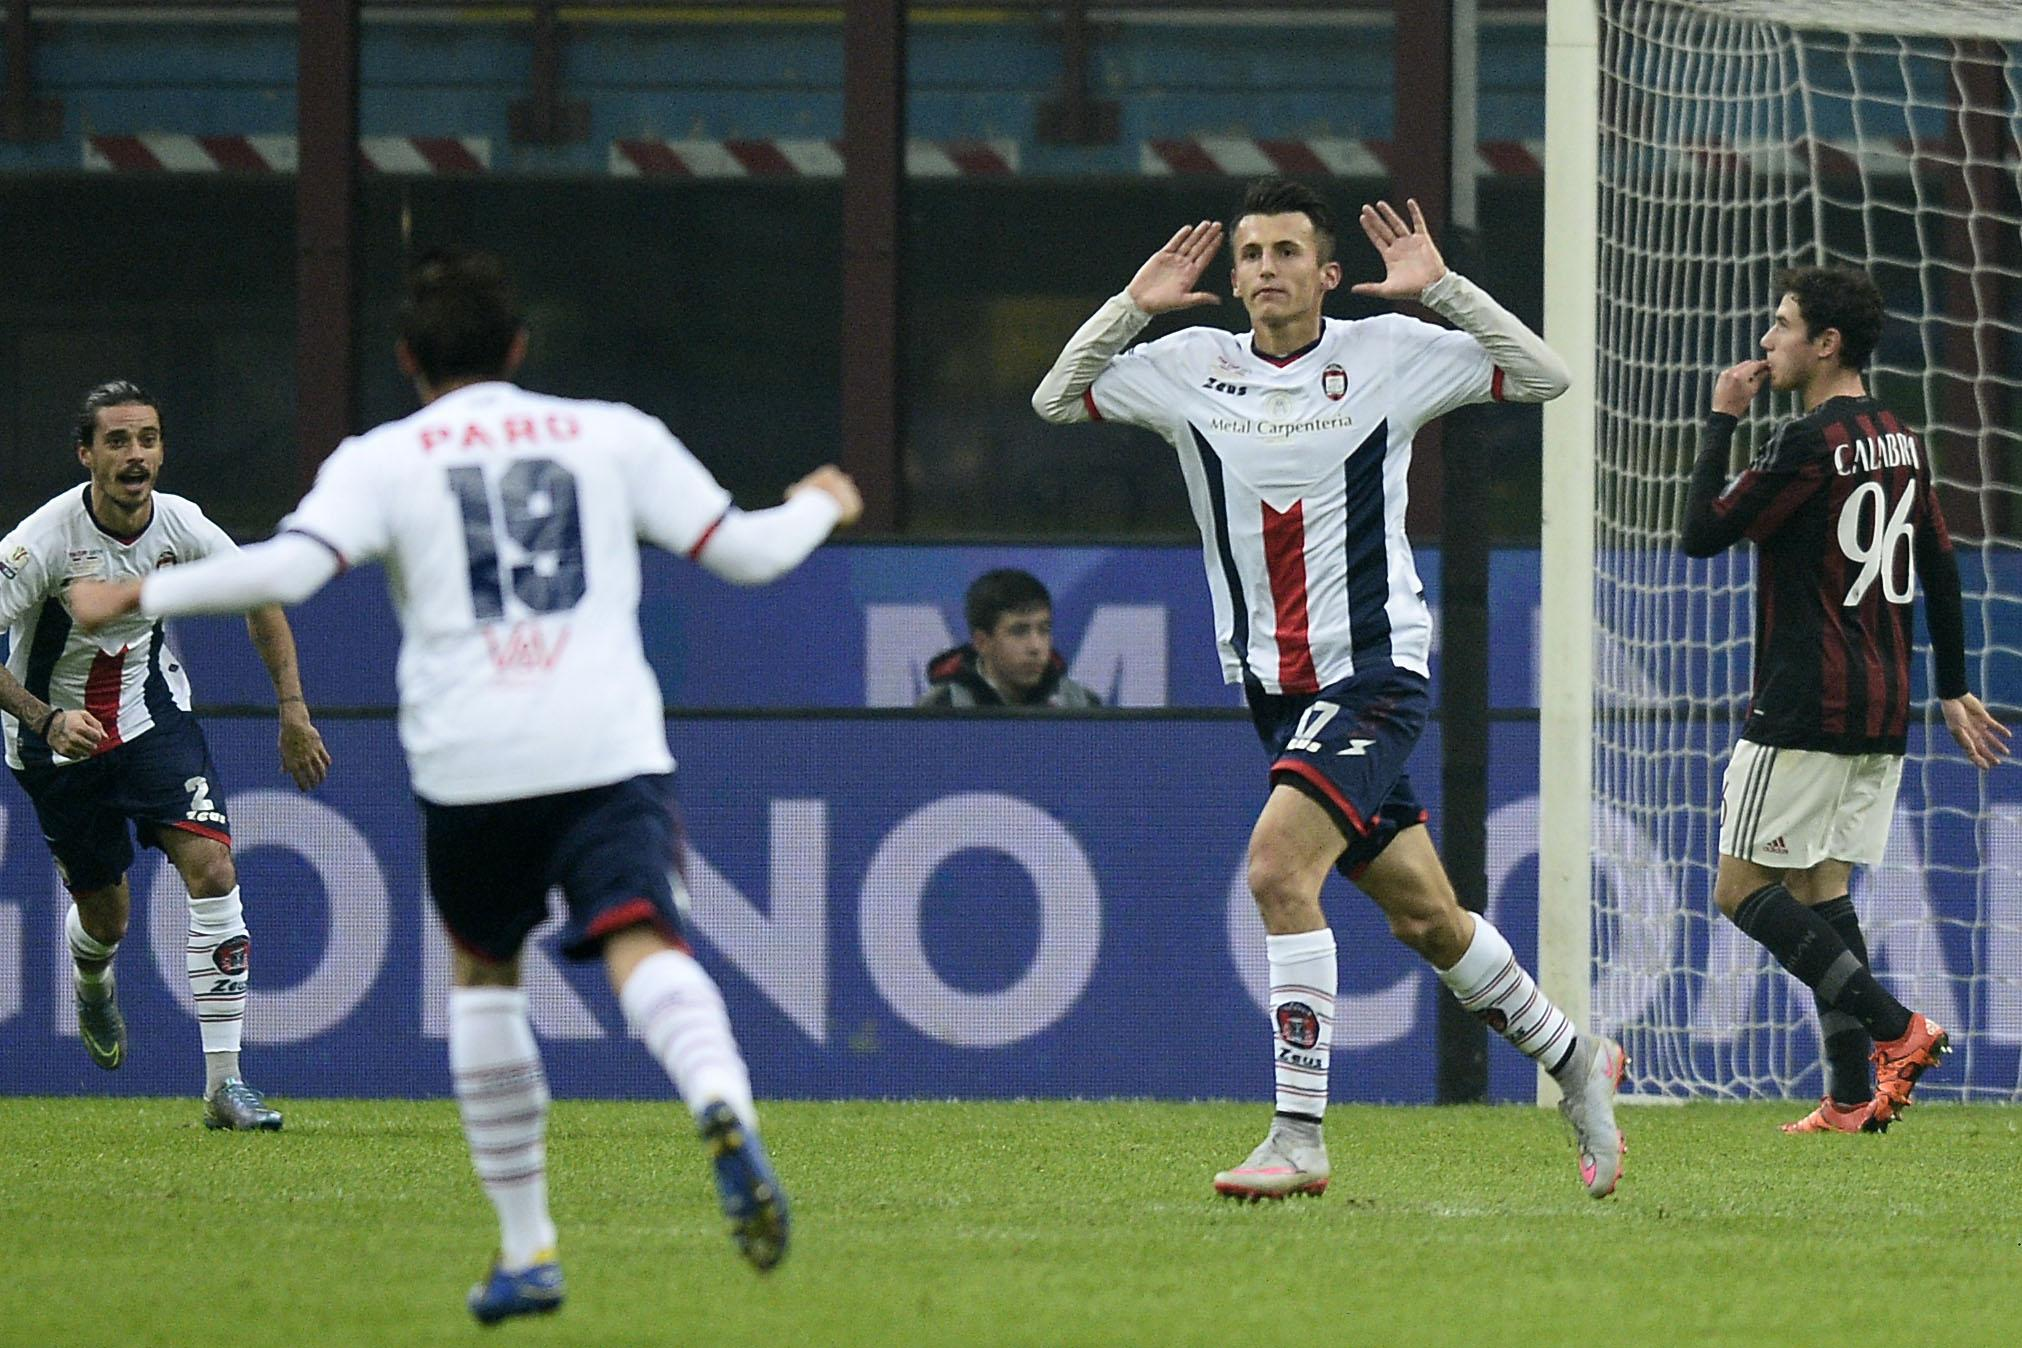 Budimir Sampdoria